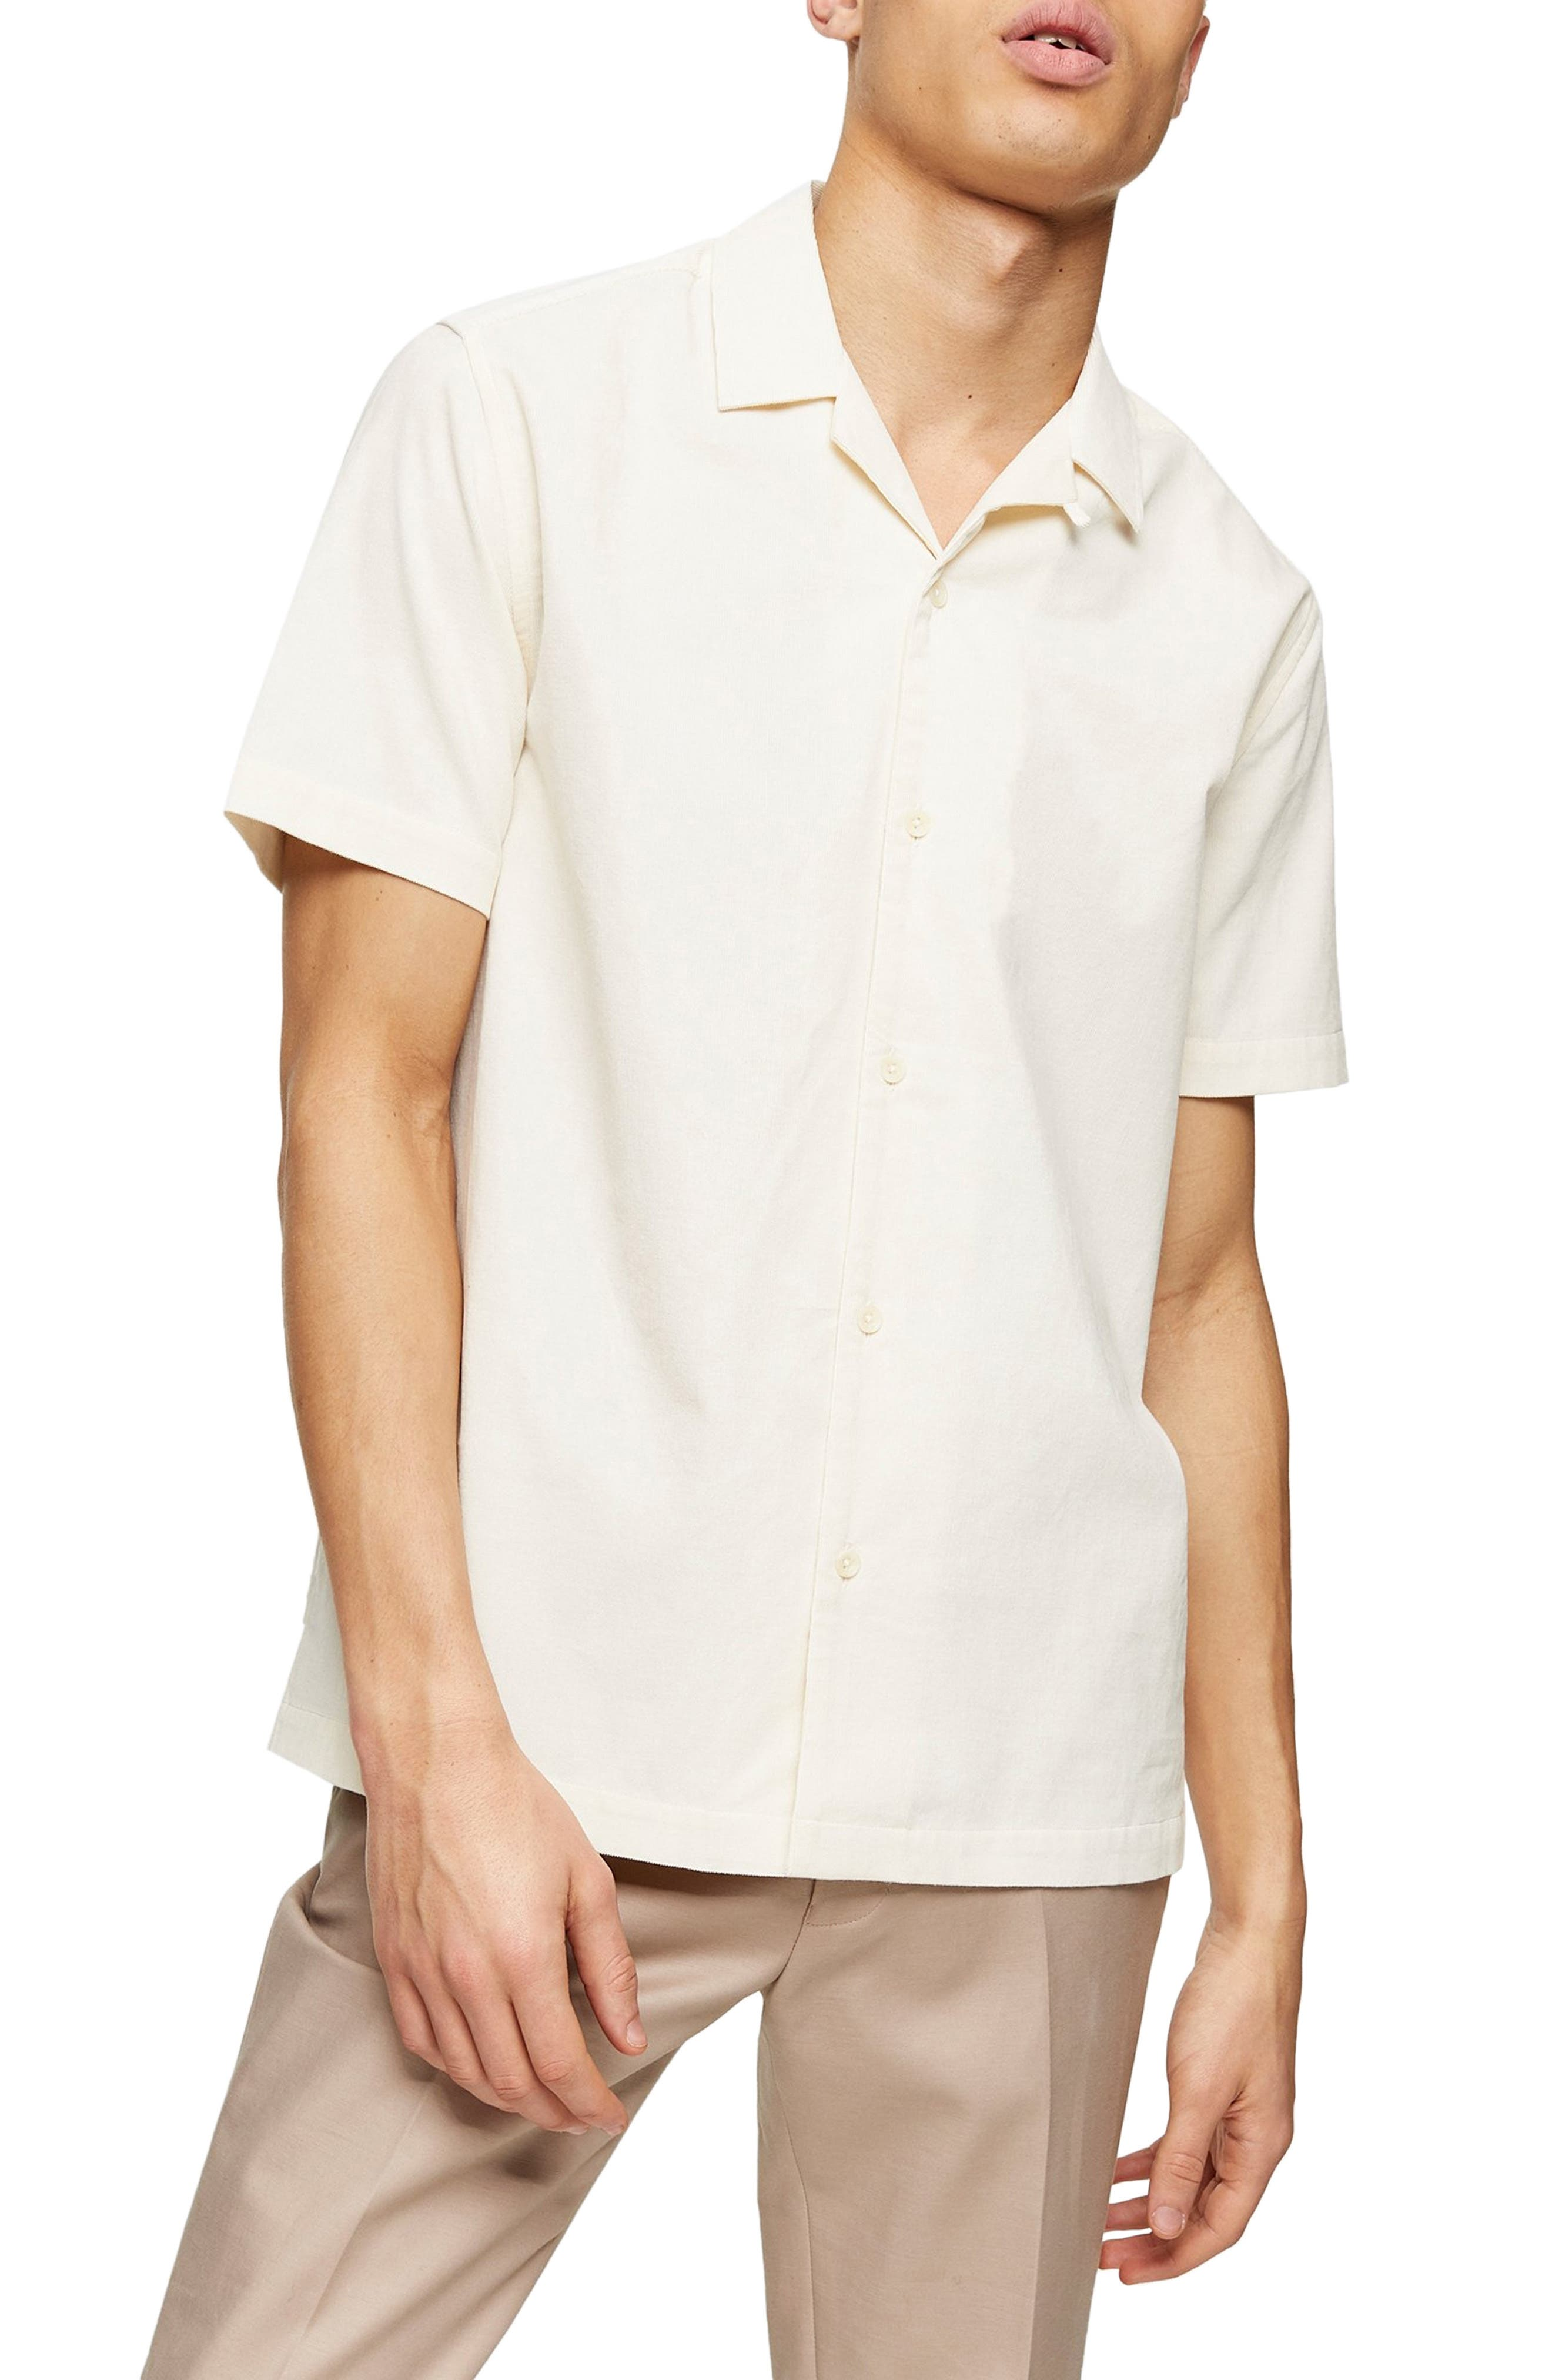 Mens Vintage Shirts – Retro Shirts Mens Topman Short Sleeve Button-Up Corduroy Camp Shirt $23.40 AT vintagedancer.com